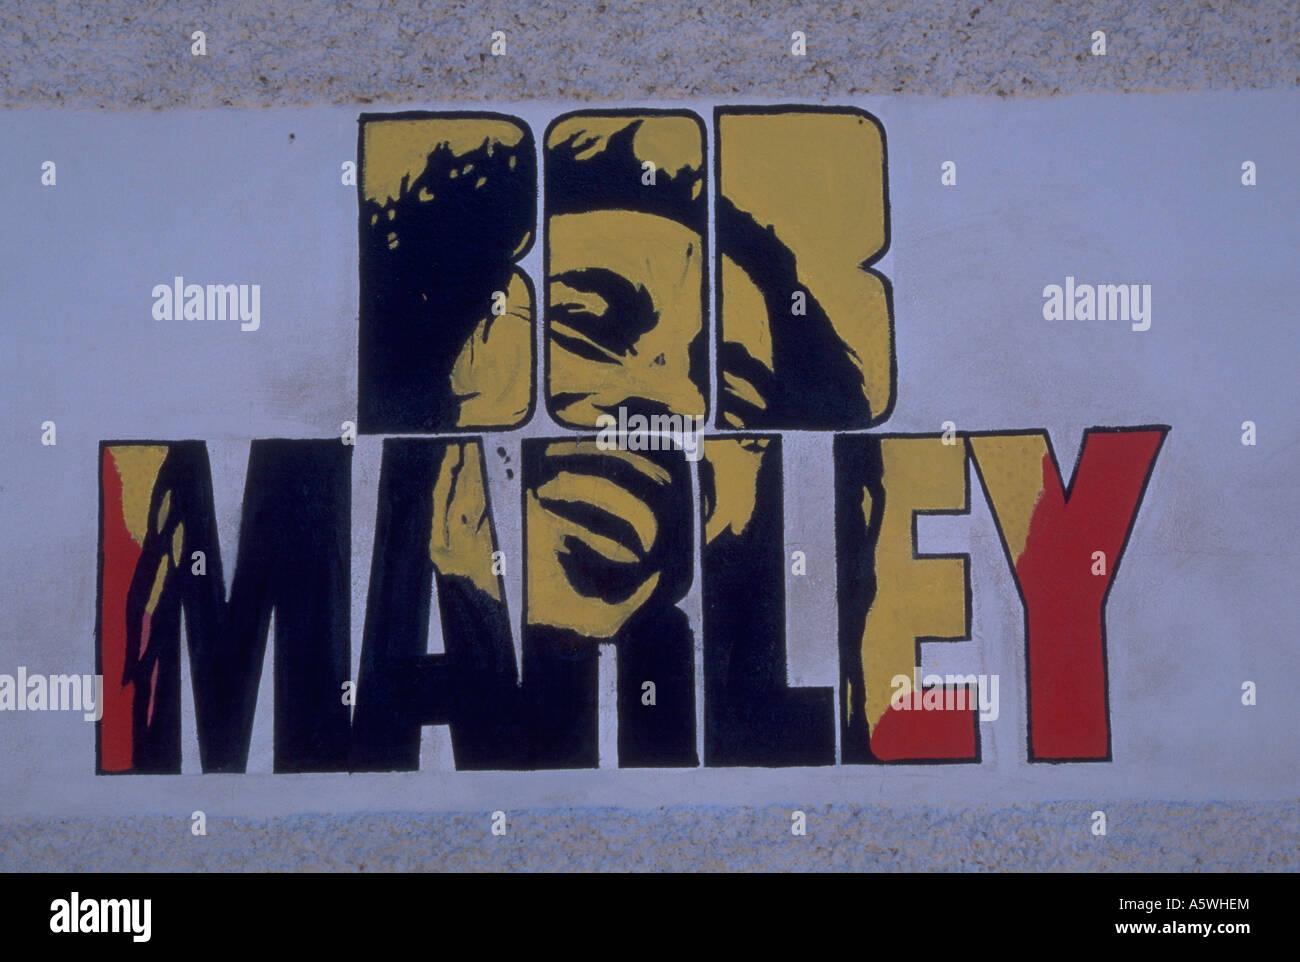 Painet hk2255 bob marley mural jamaica reggae rastafari for Bob marley mural